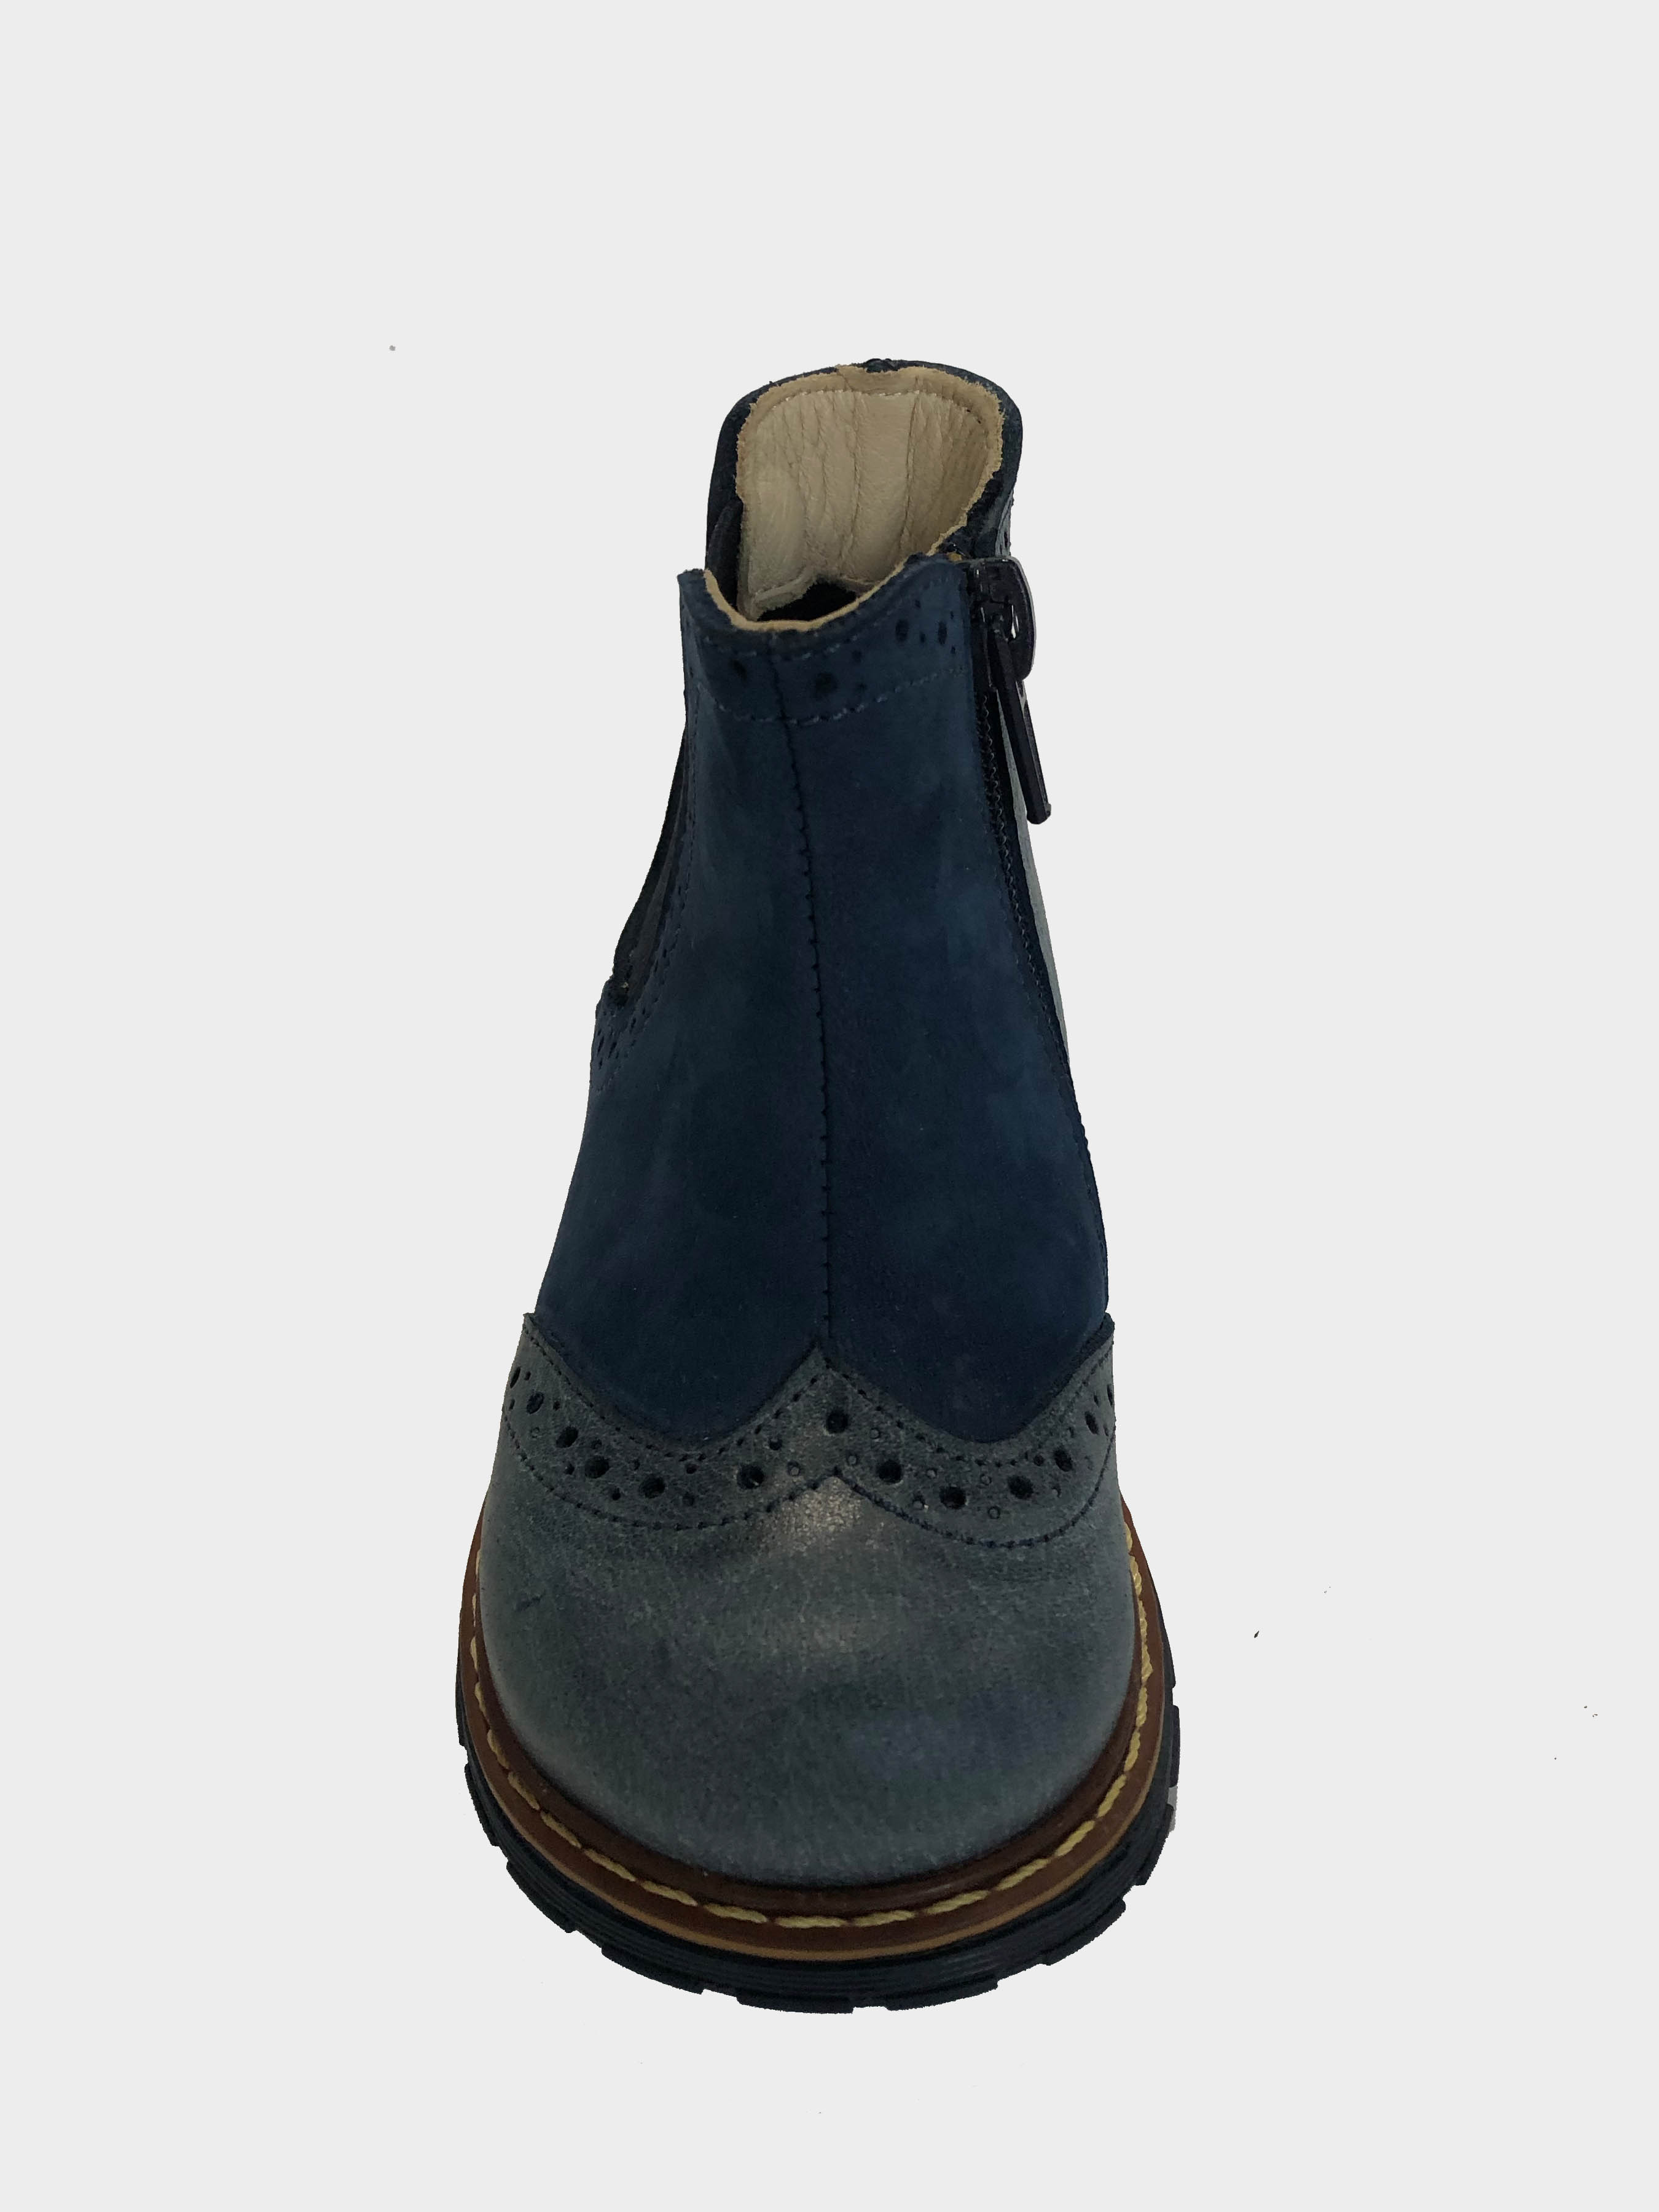 Ботинки детские Martens Baby Navy 141-3K размеры обуви, 2017